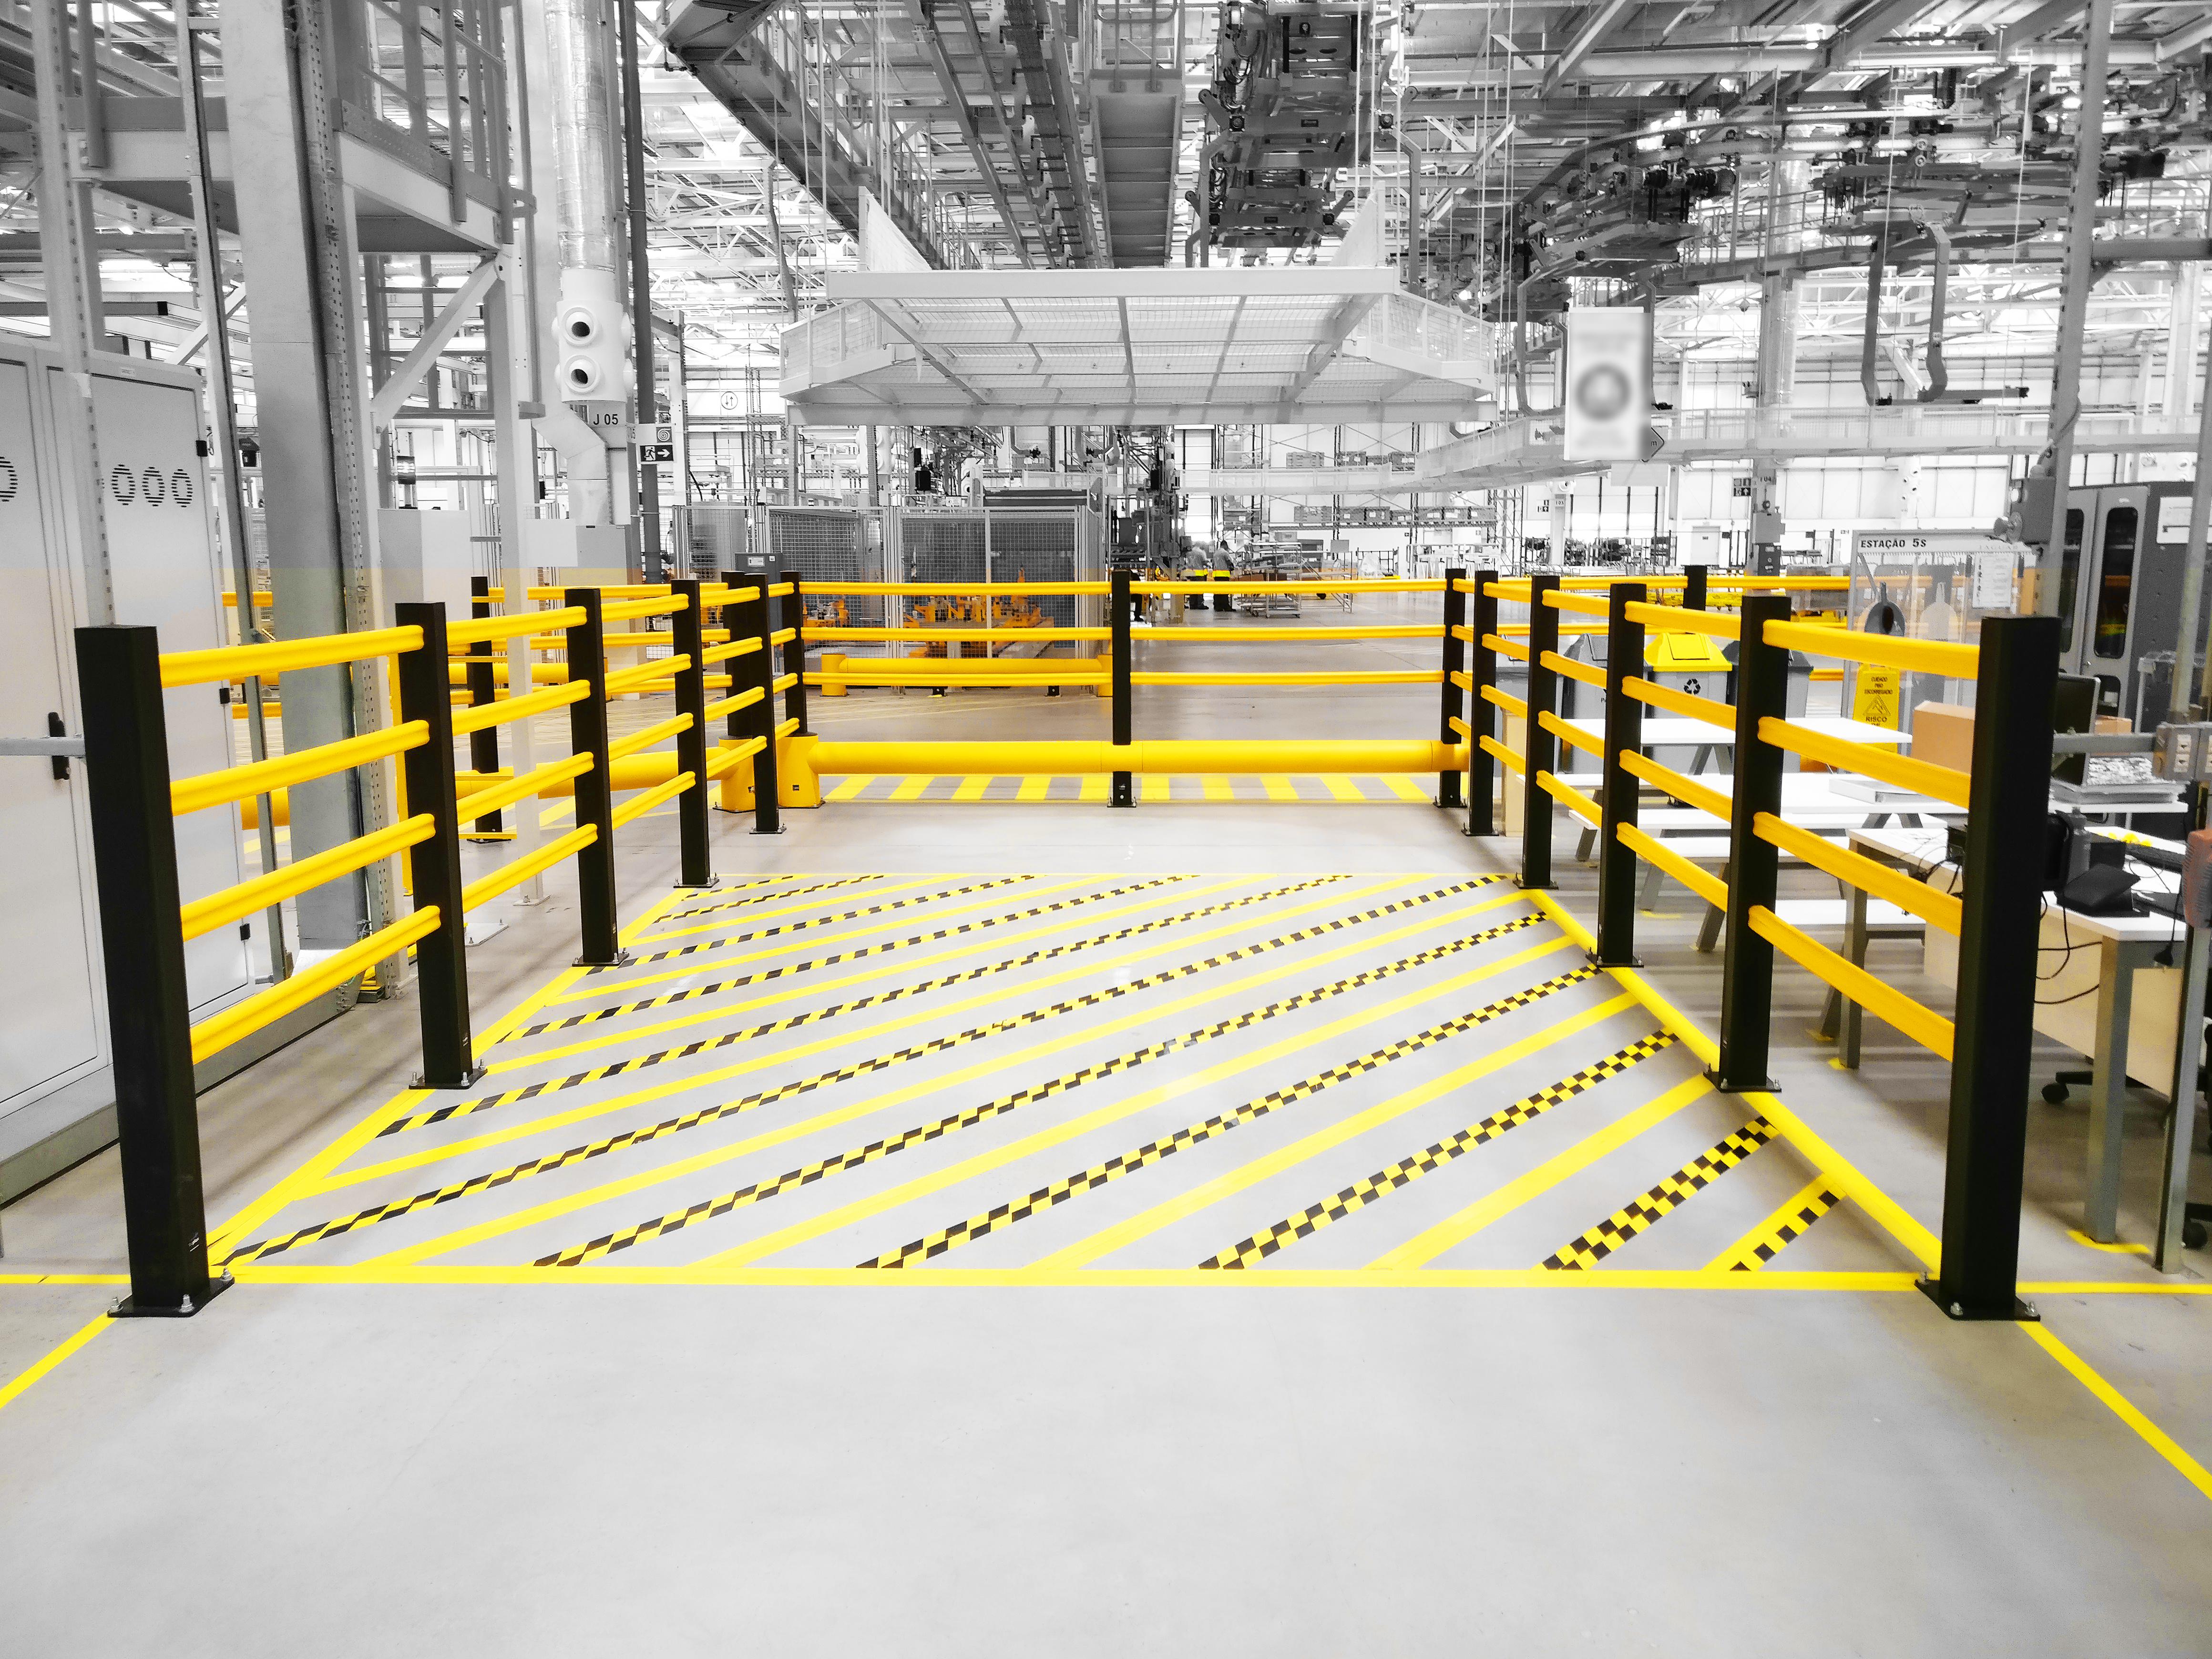 barriere-protection-pieton-securite-entreprise